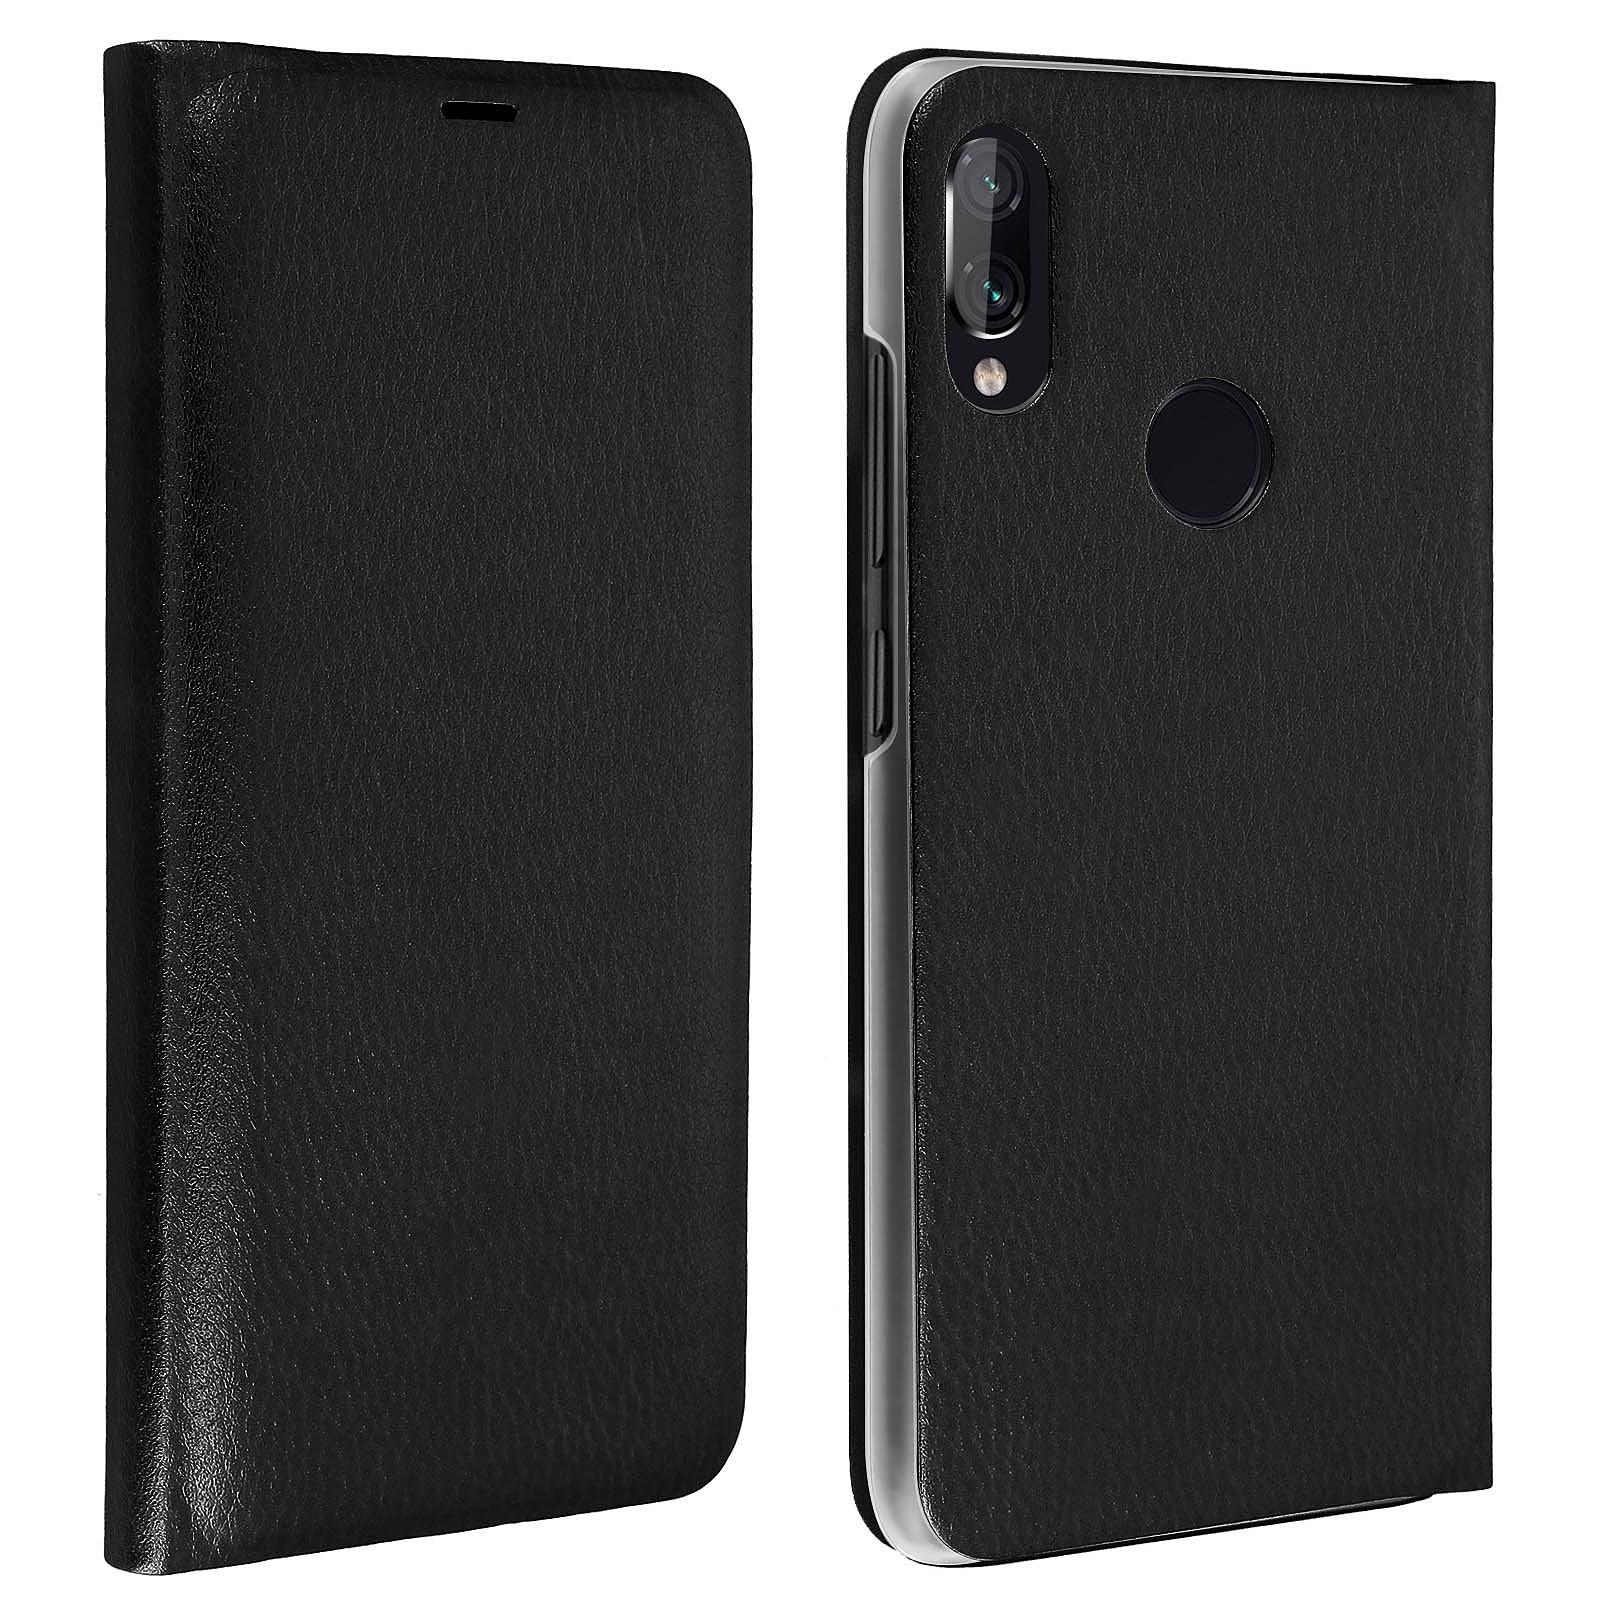 Avizar Etui folio Noir pour Xiaomi Redmi Note 7